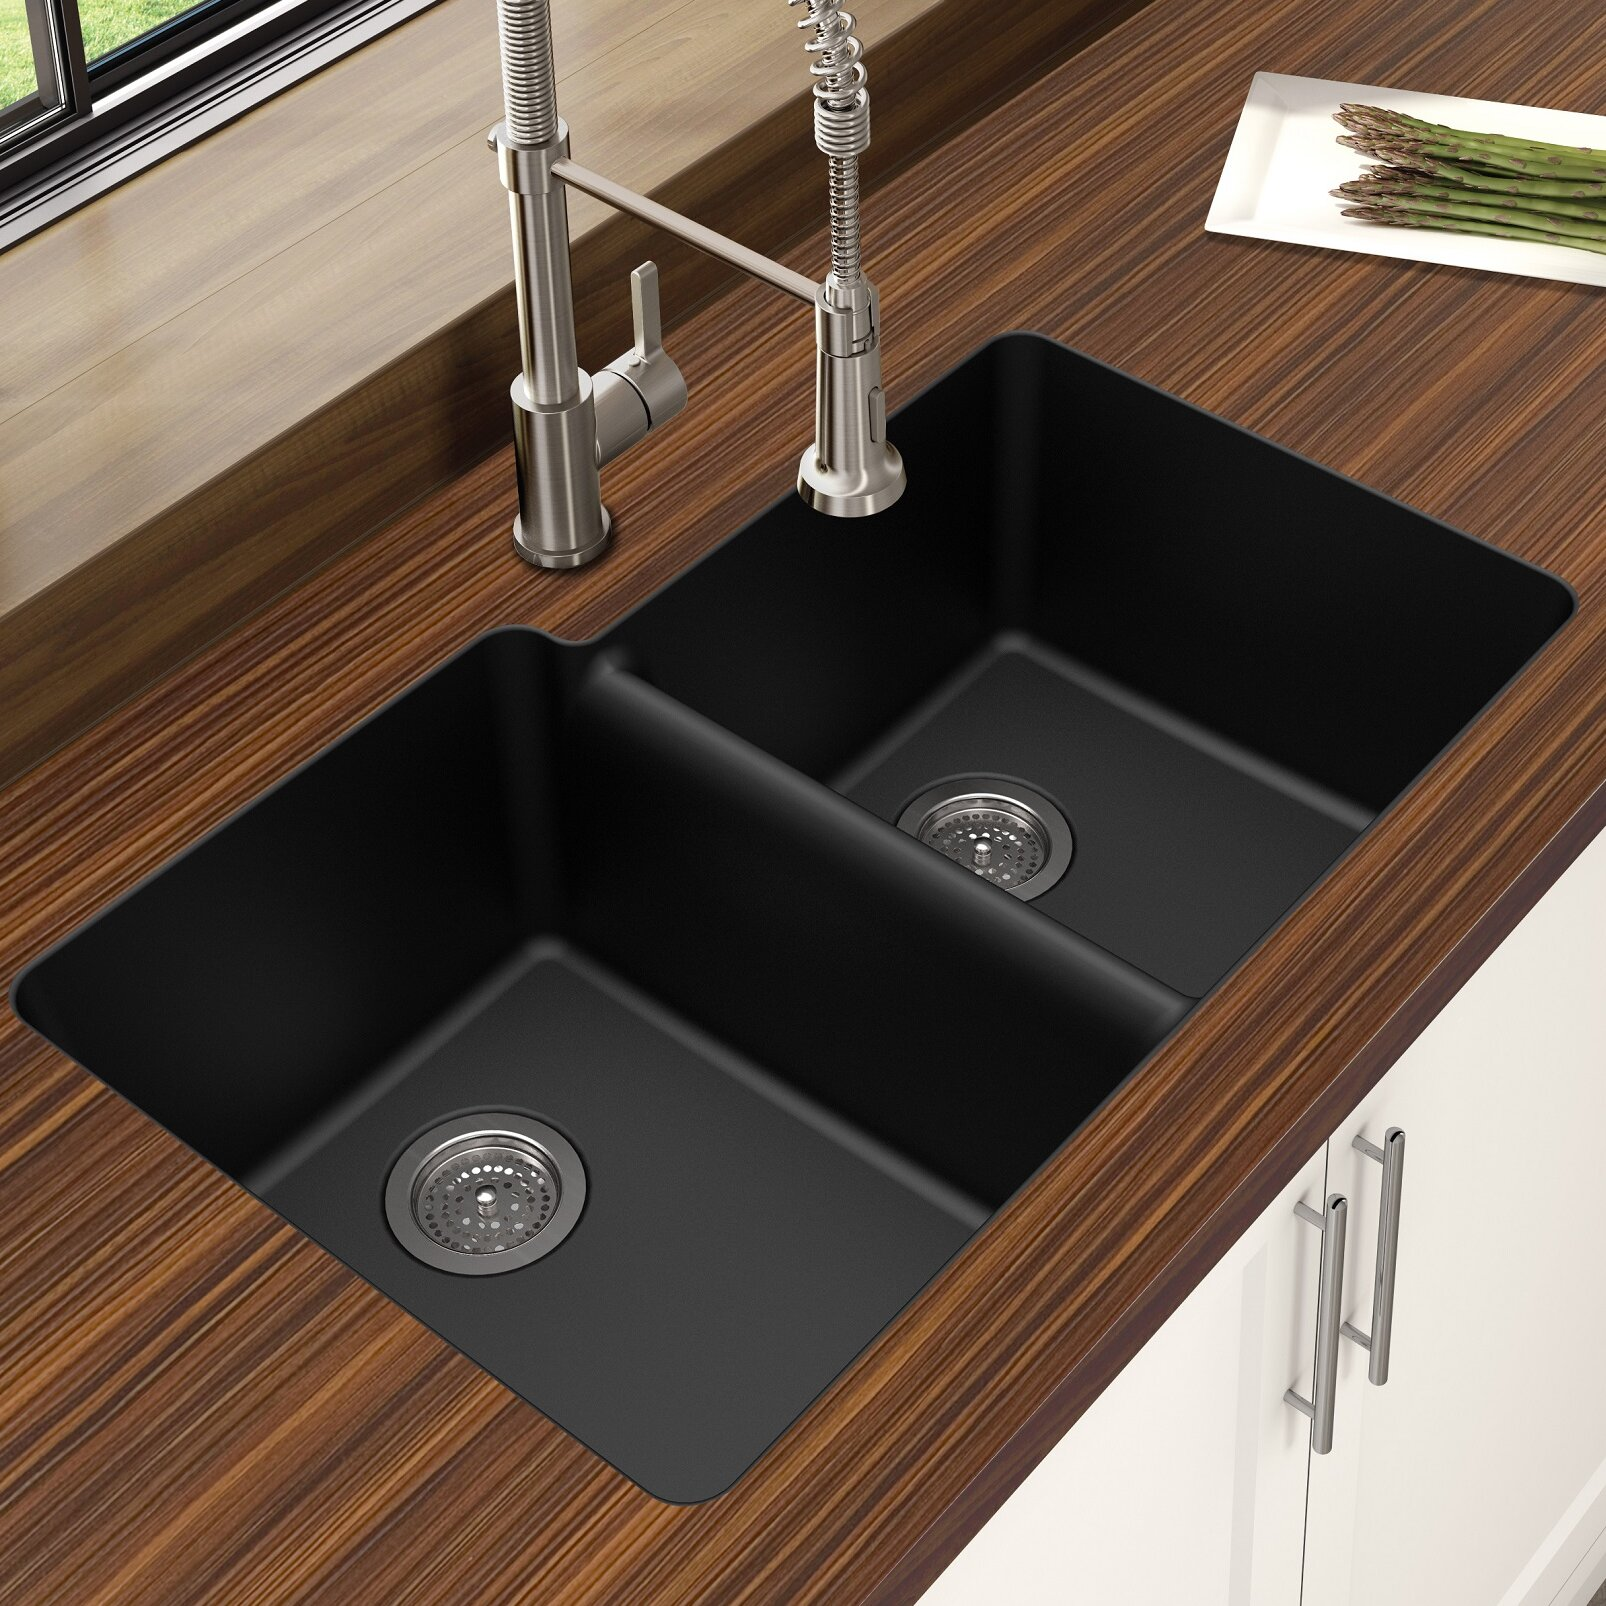 Winpro Granite Quartz Offset 33 L X 21 W Double Basin Undermount Kitchen Sink Reviews Wayfair